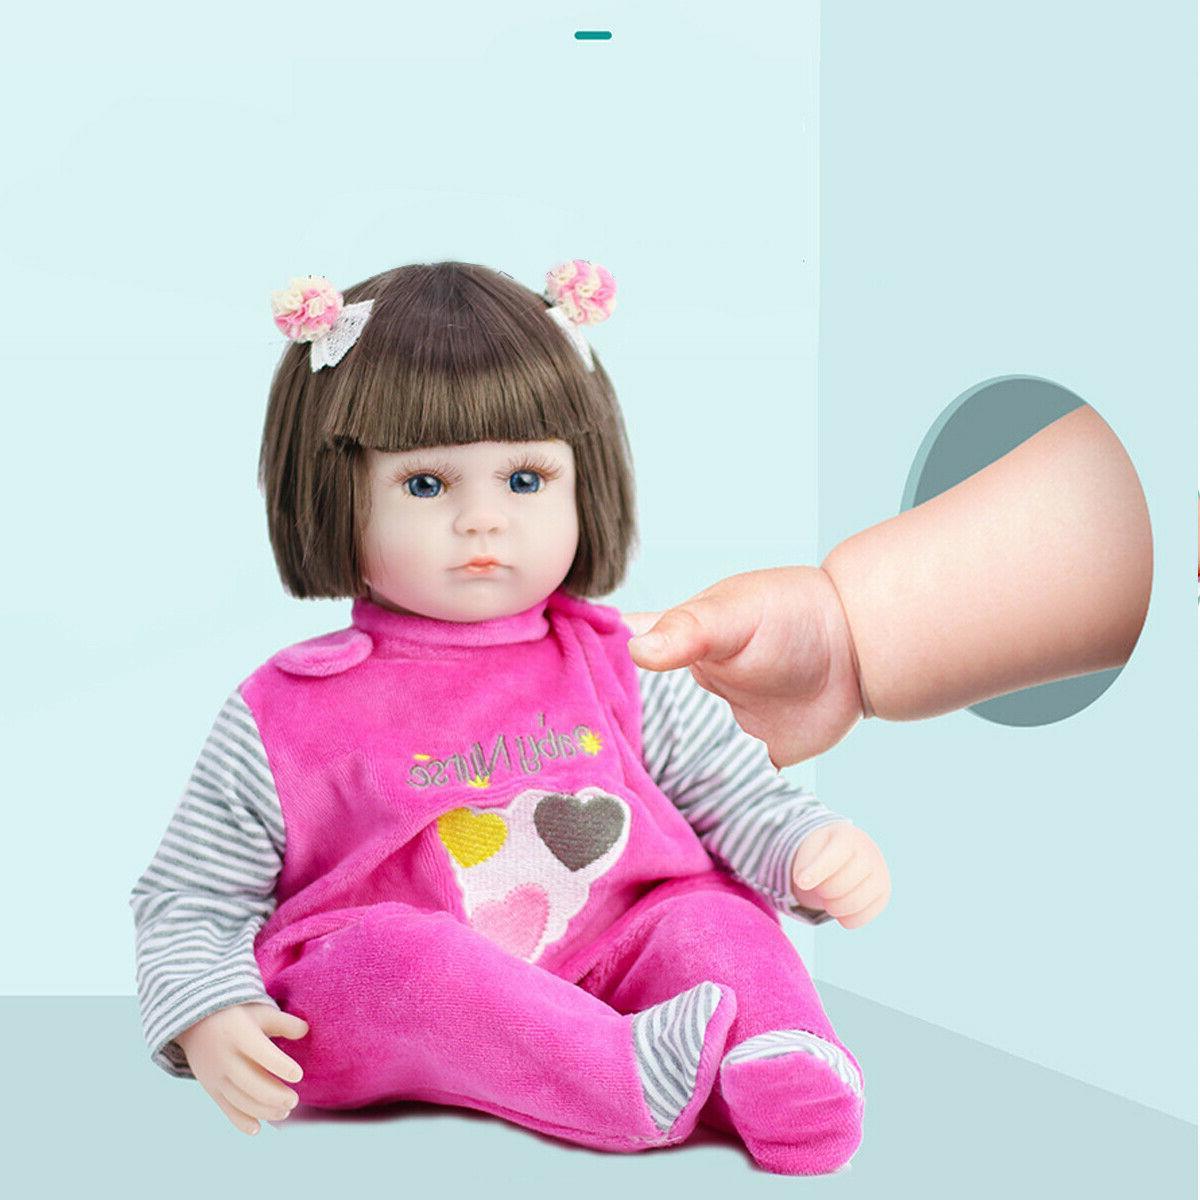 45cm Real Life Newborn Body Vinyl Baby Dolls